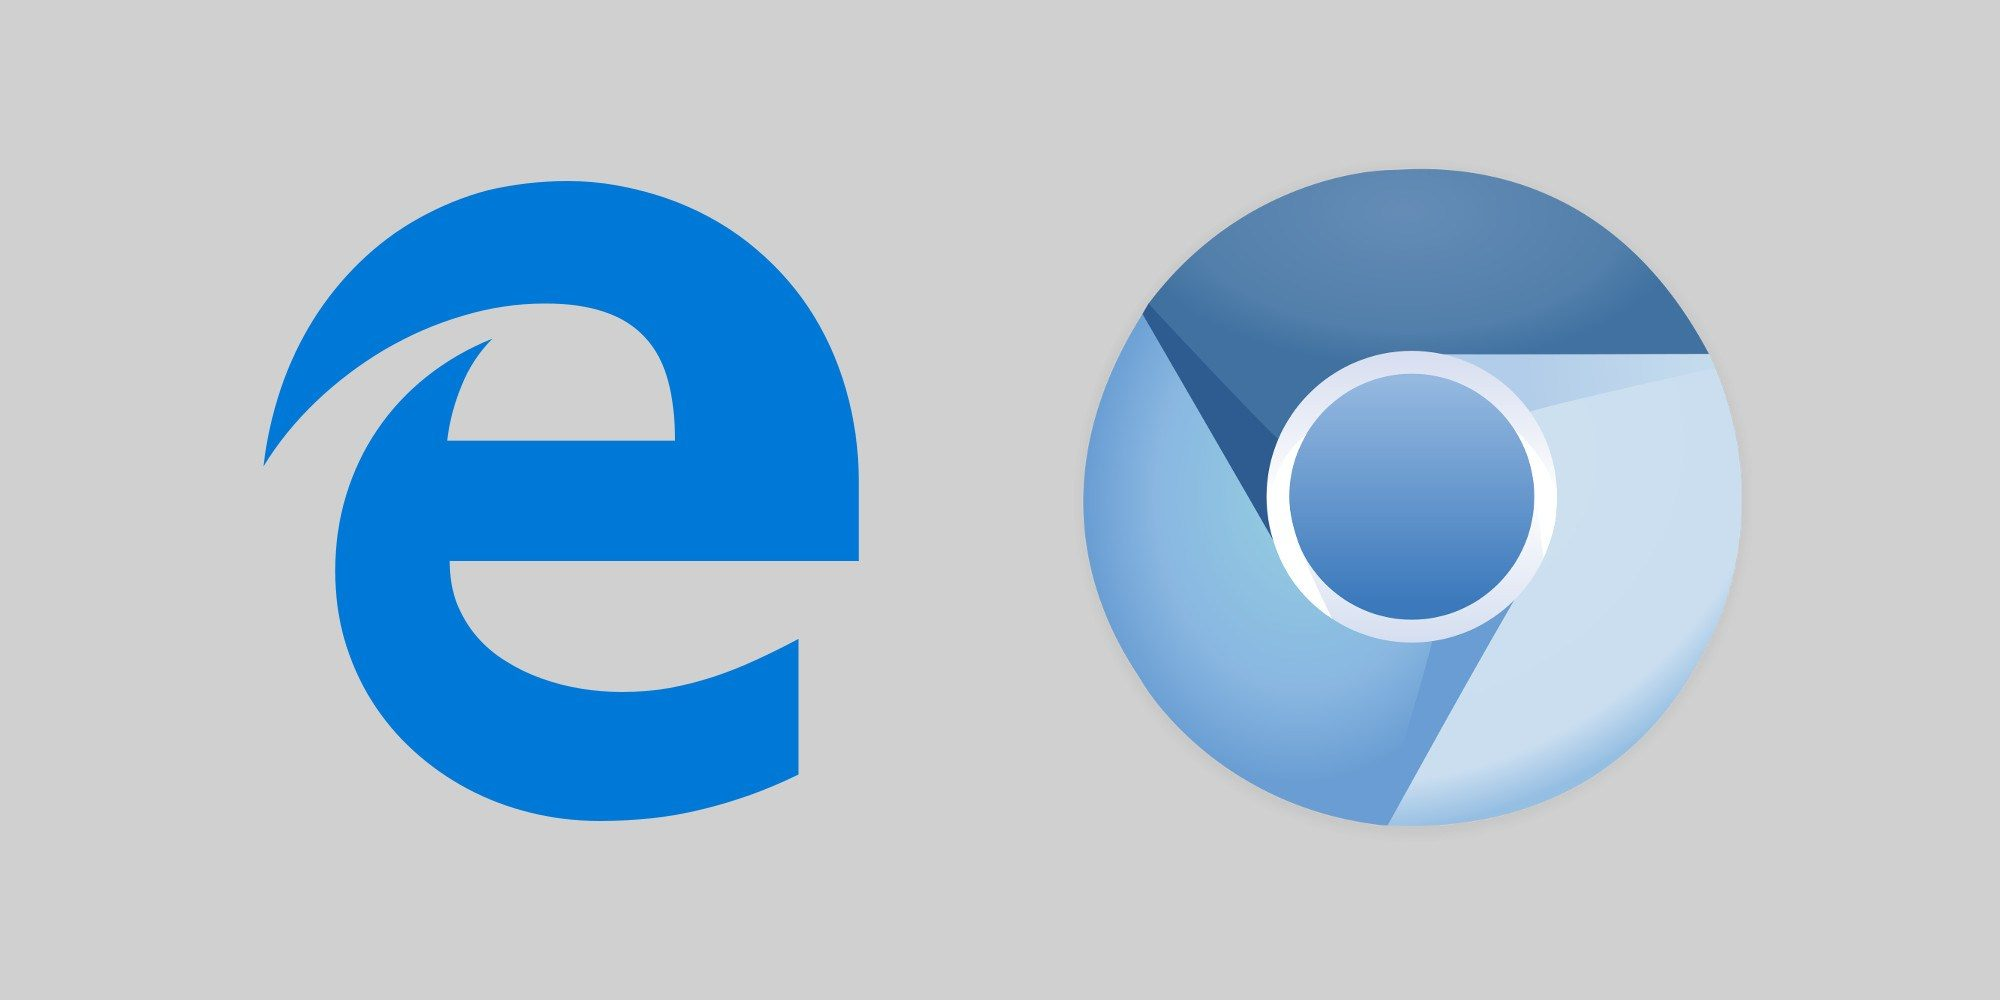 Chromium de Microsoft ya está disponible para descargar